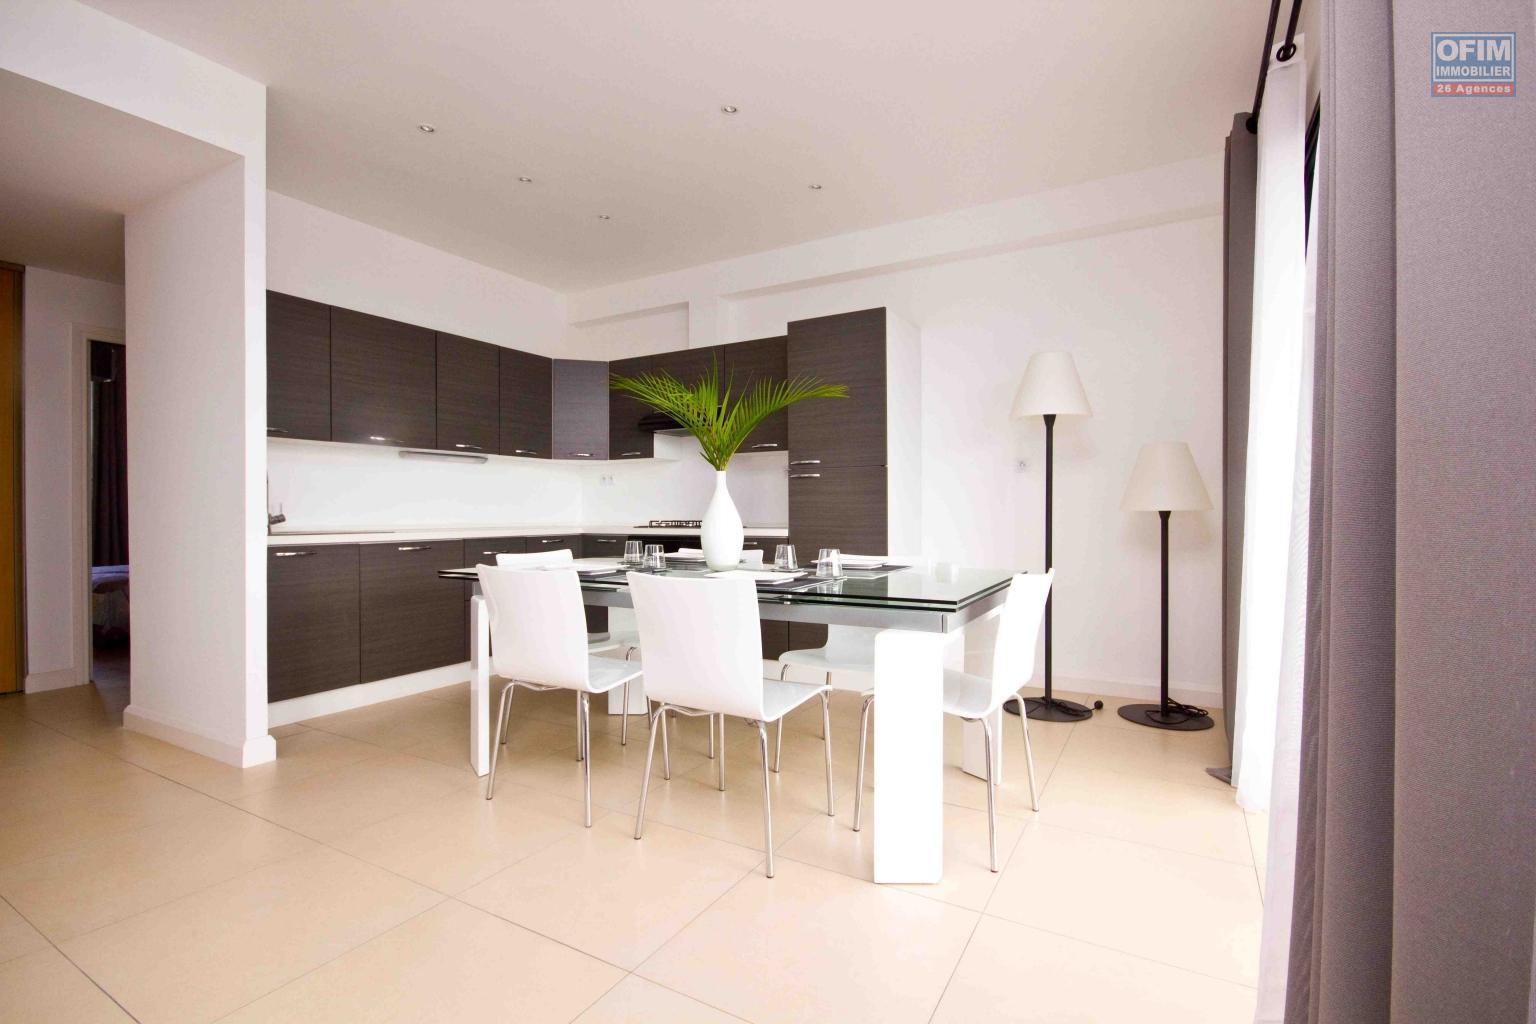 Vente appartement antananarivo tananarive a vendre for Vente appartement